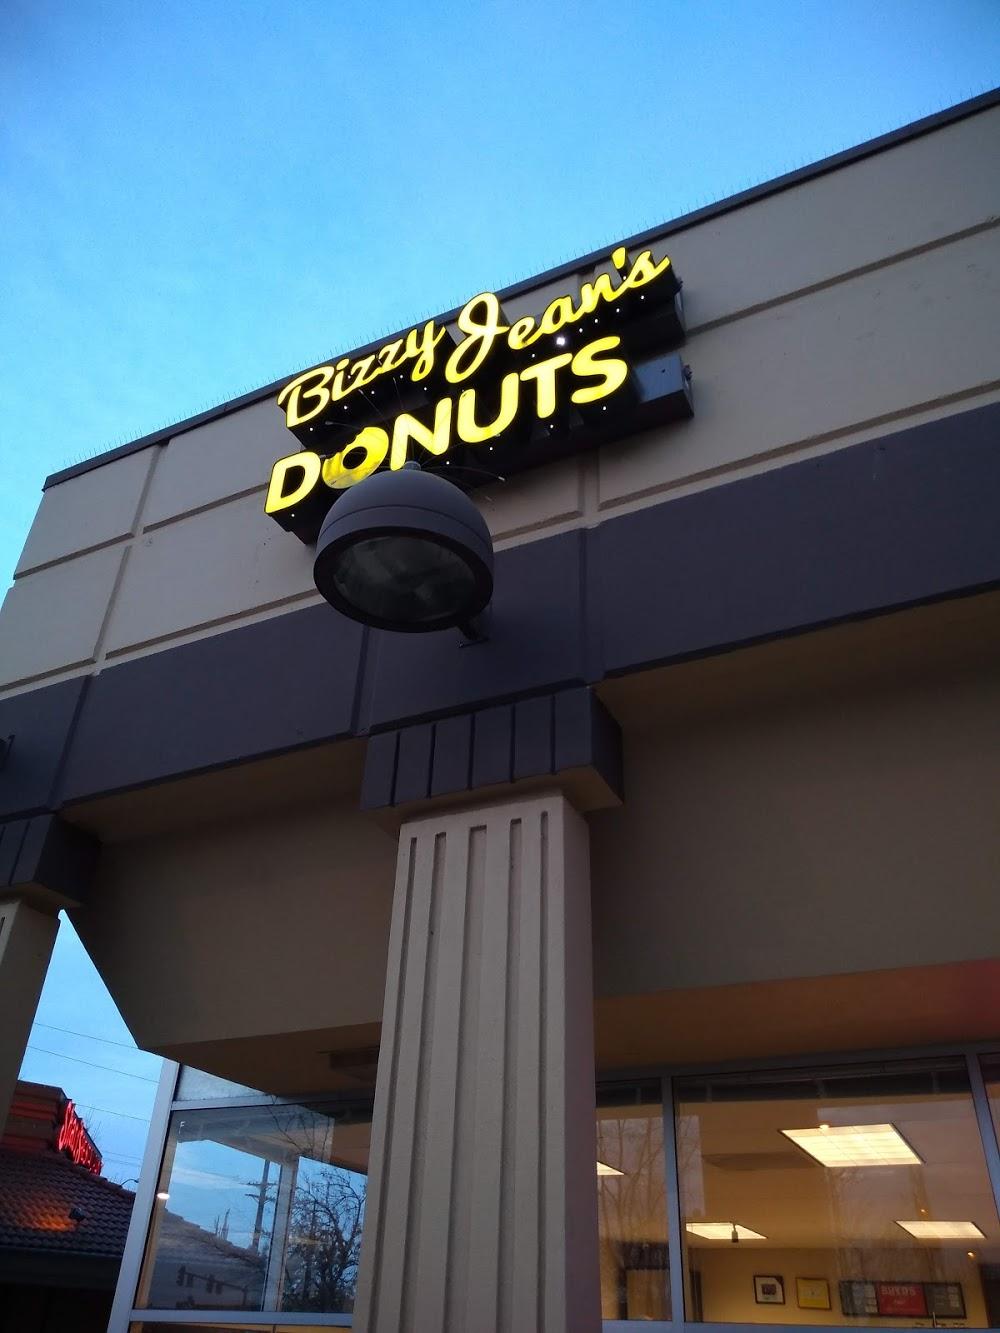 Bizzy Jean's Donuts